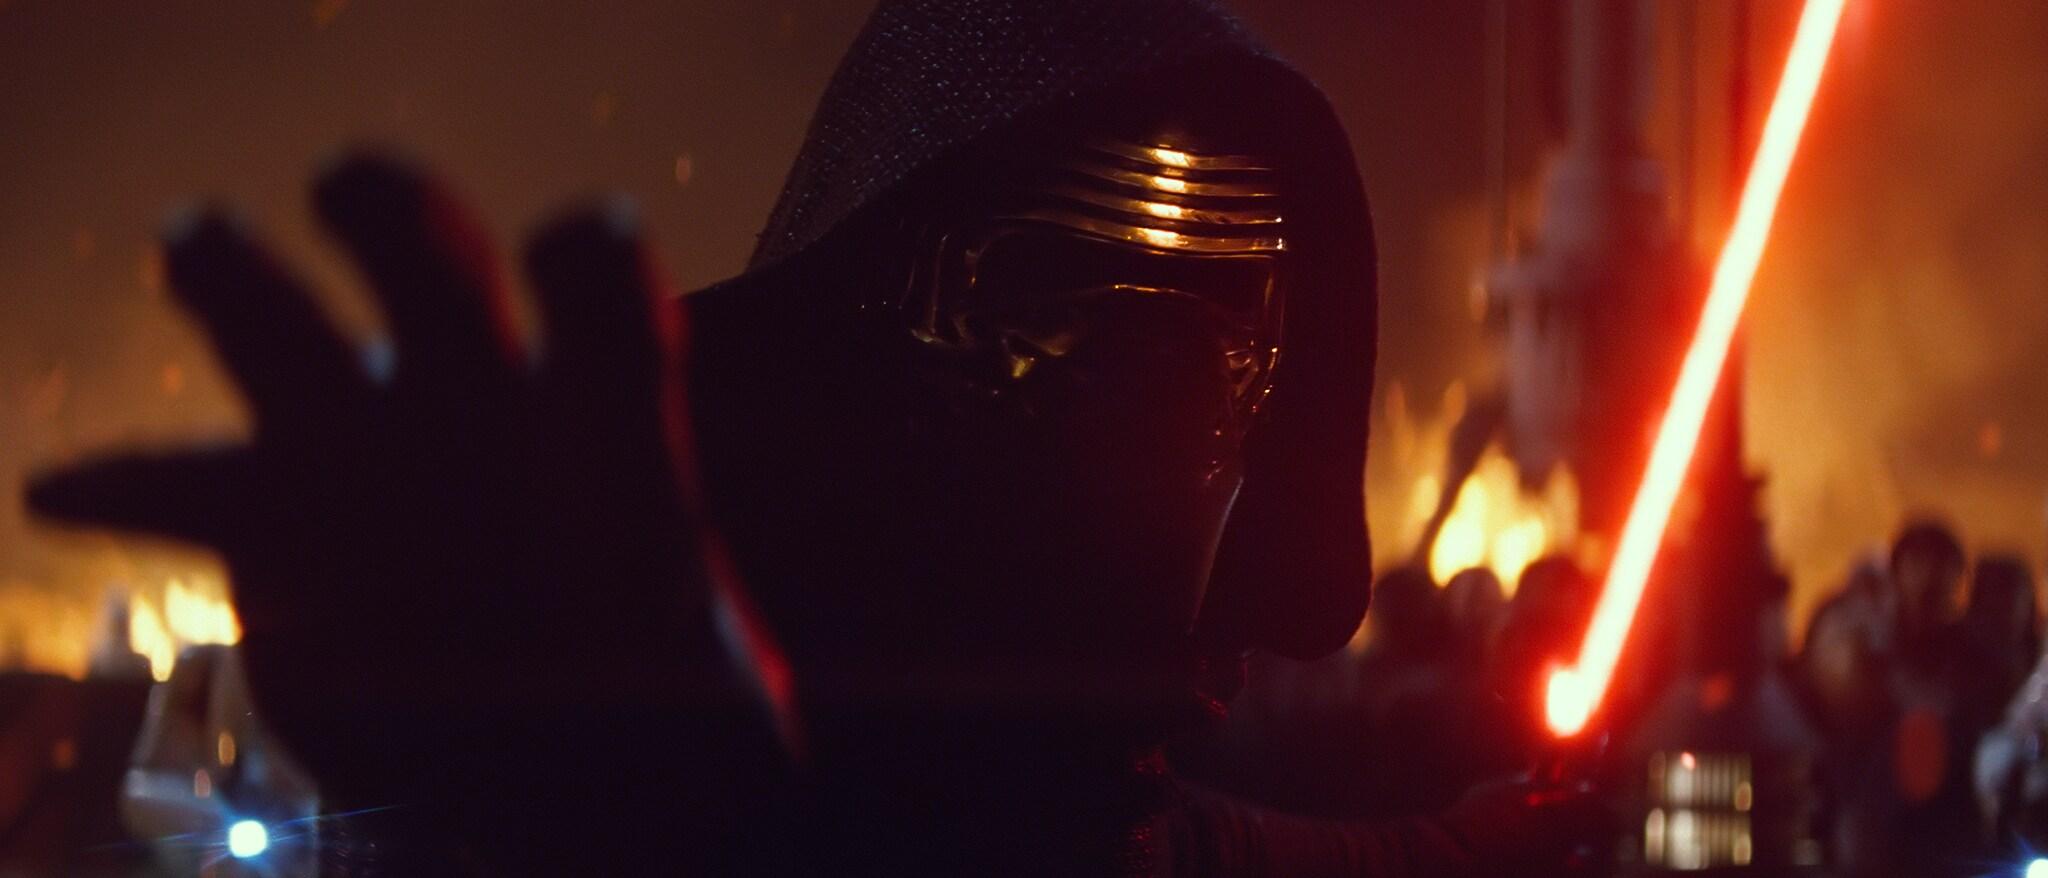 Star Wars: Episode VII The Force Awakens Hero